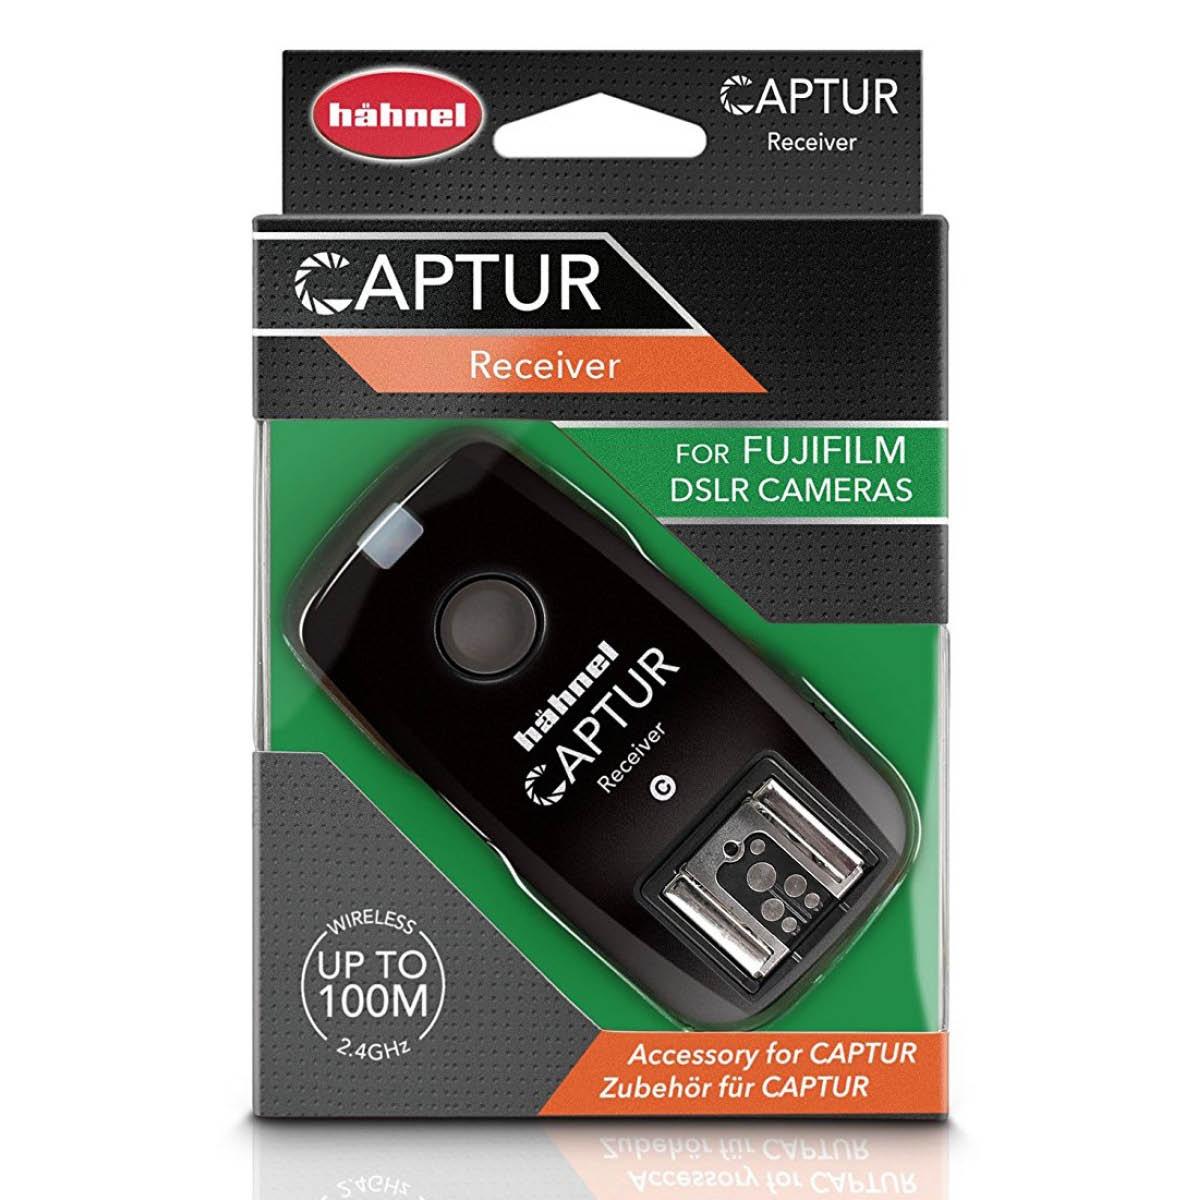 Hähnel Captur Funkempfänger Fujifilm